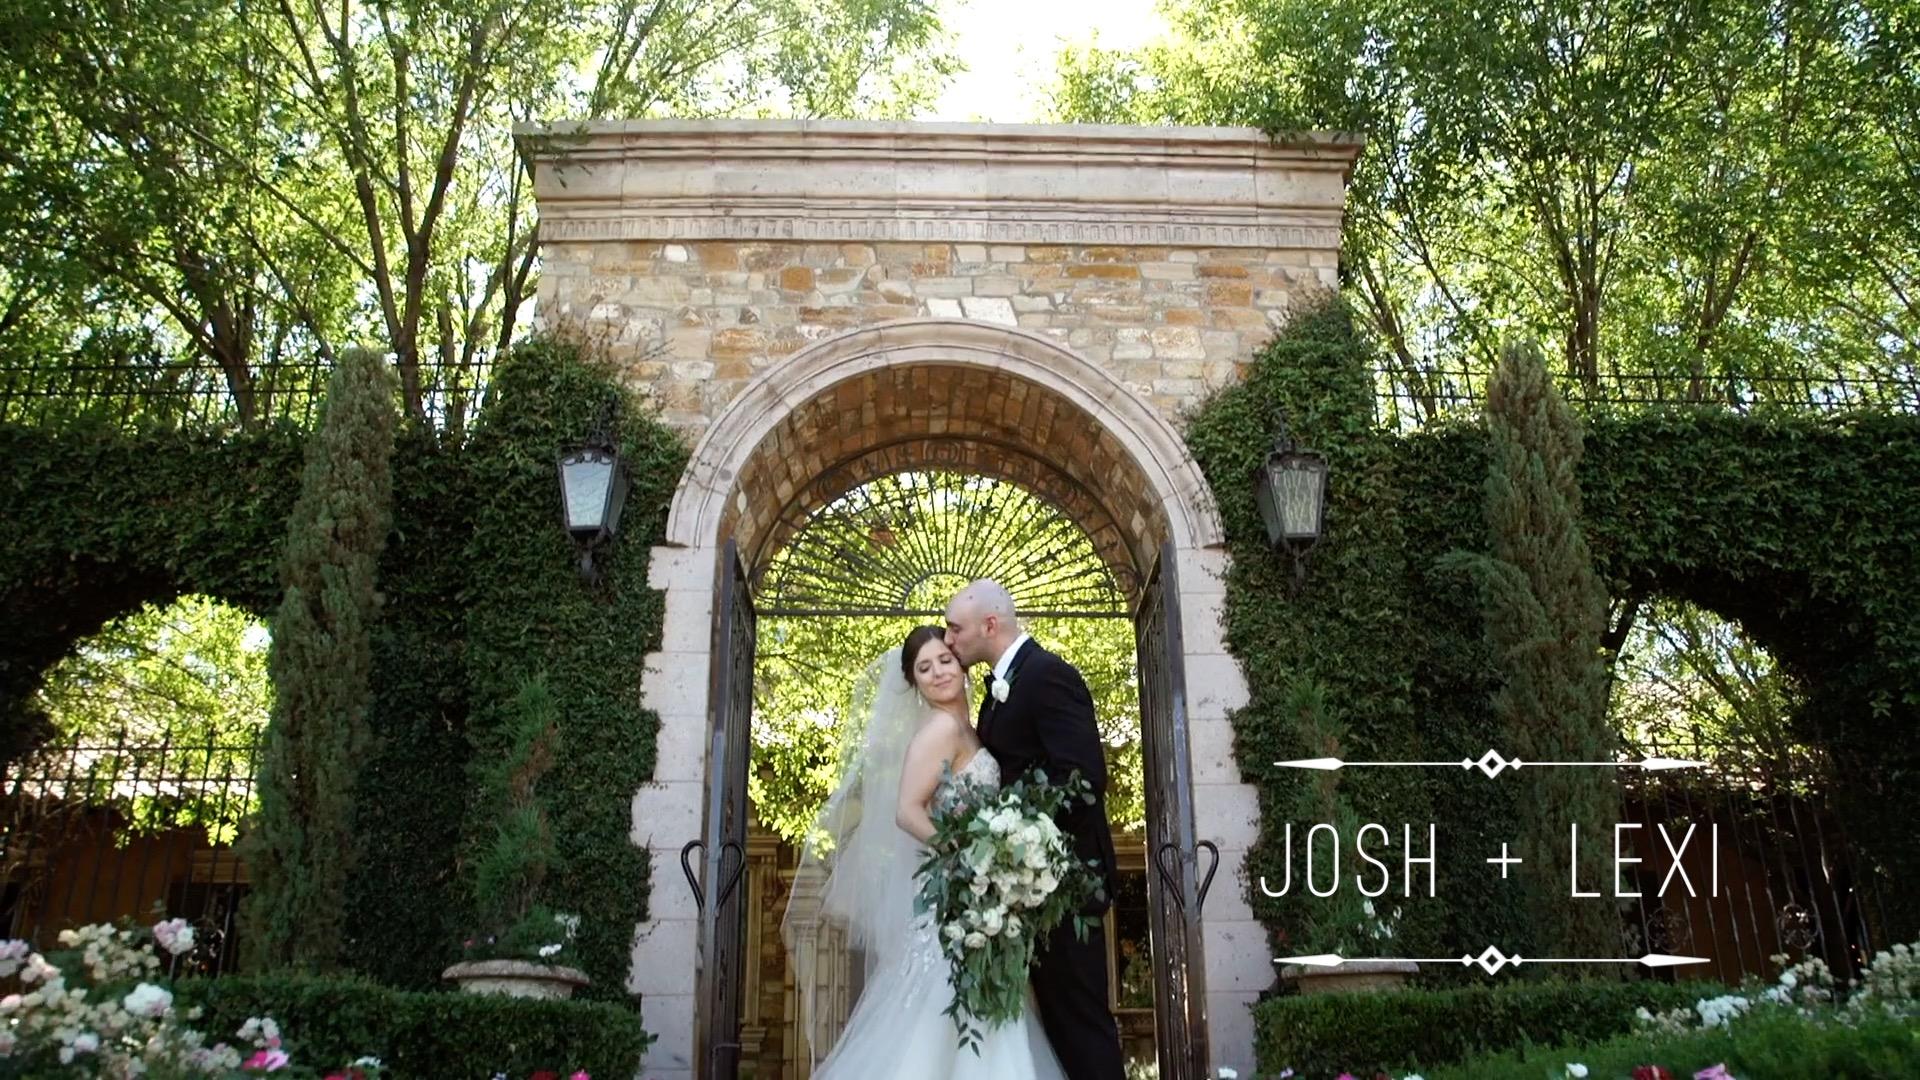 Josh  + Lexi | Scottsdale, Arizona | Villa Siena